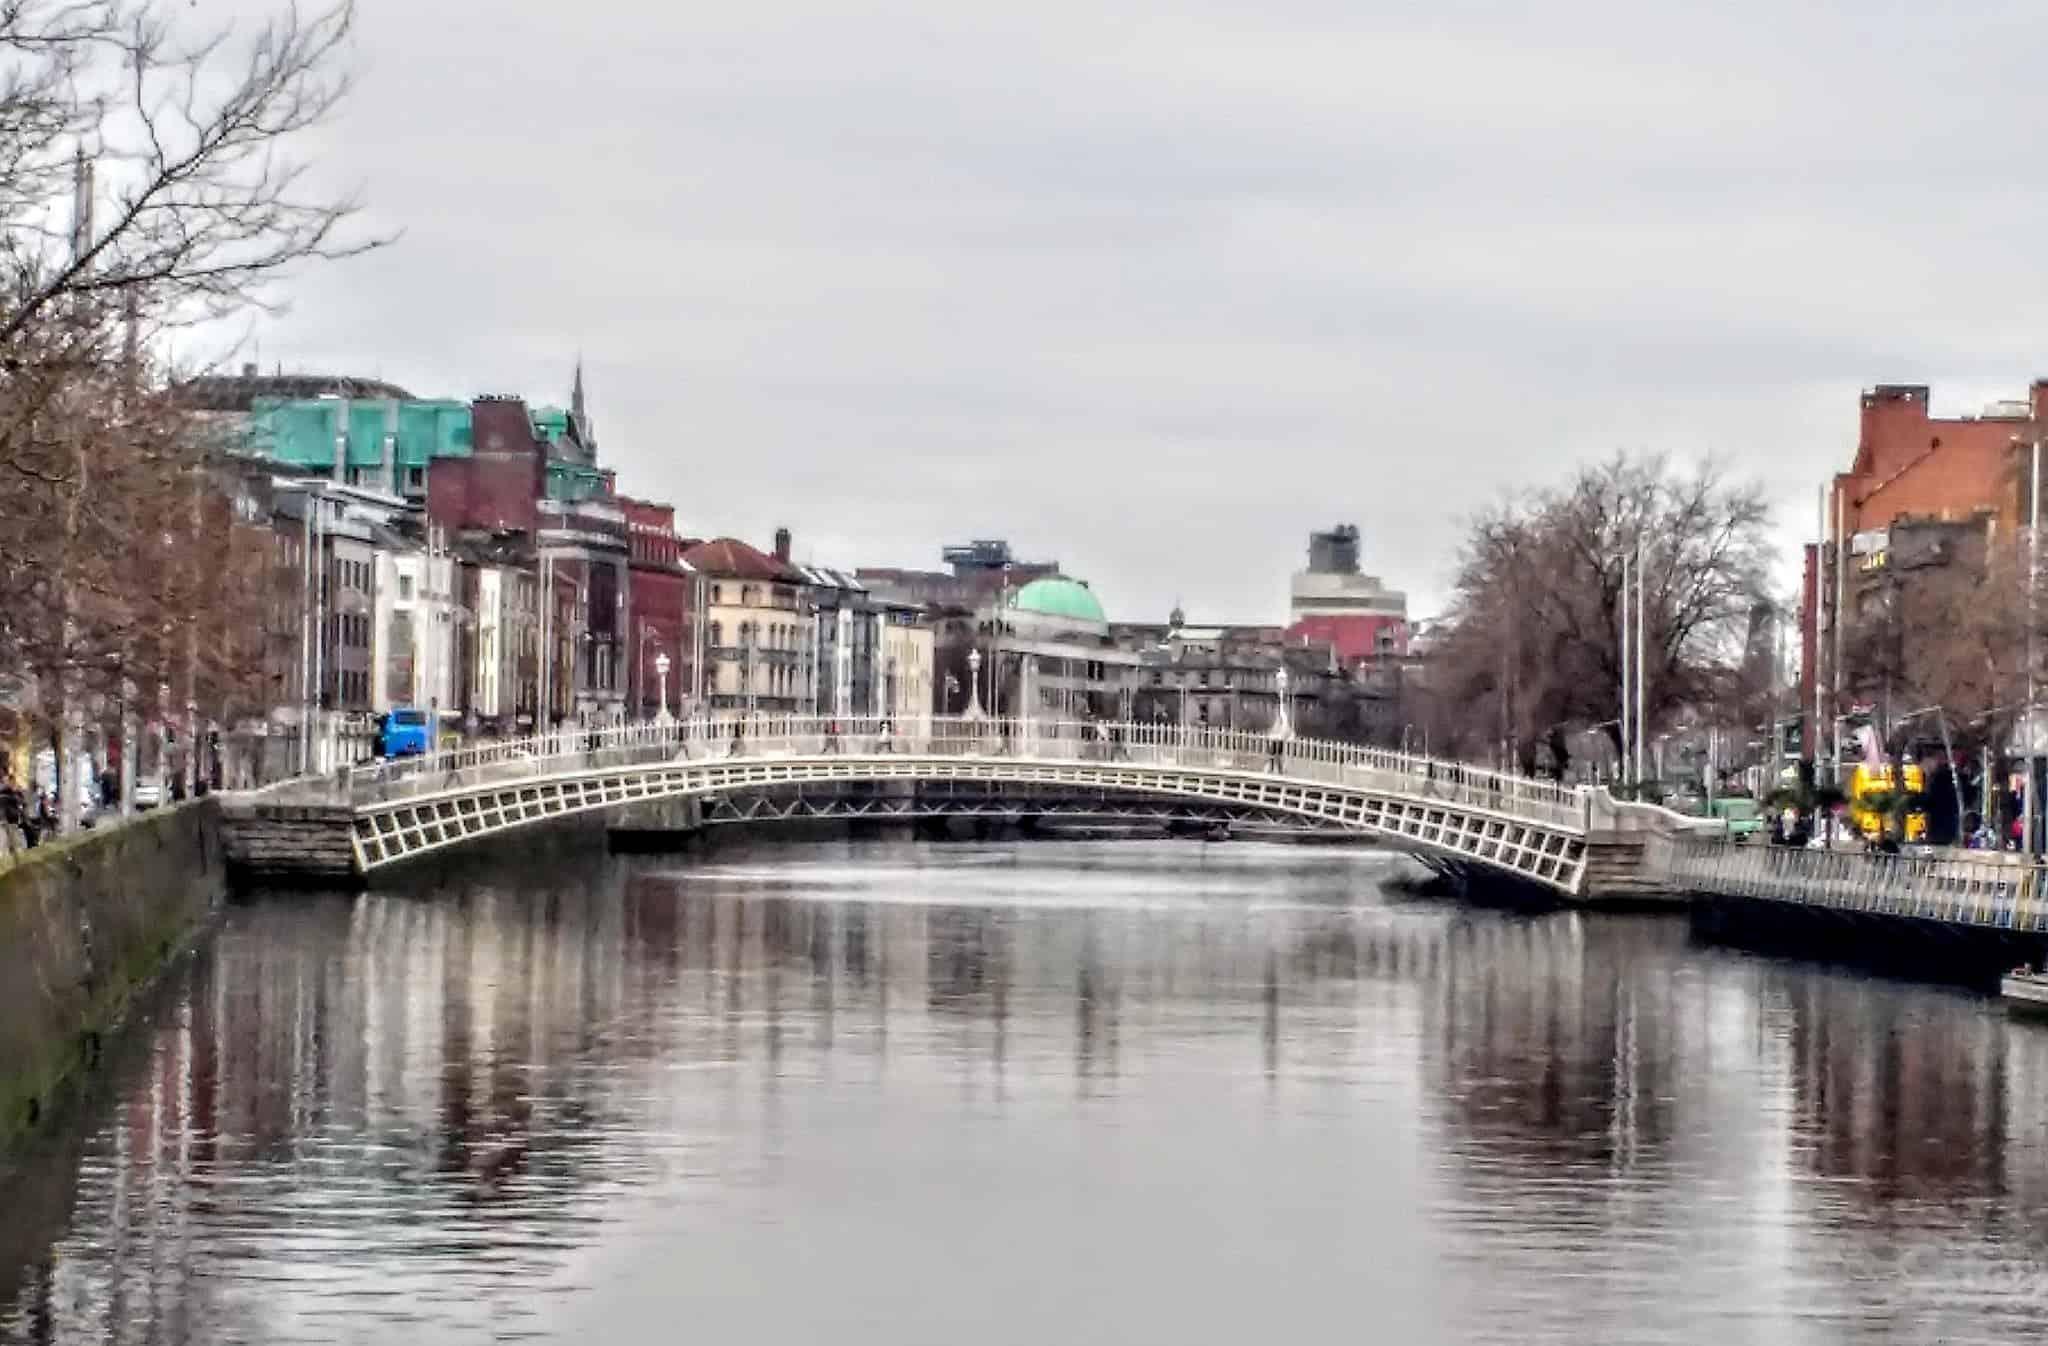 15 Dublin Don'ts - a little bit of Irish craic for you